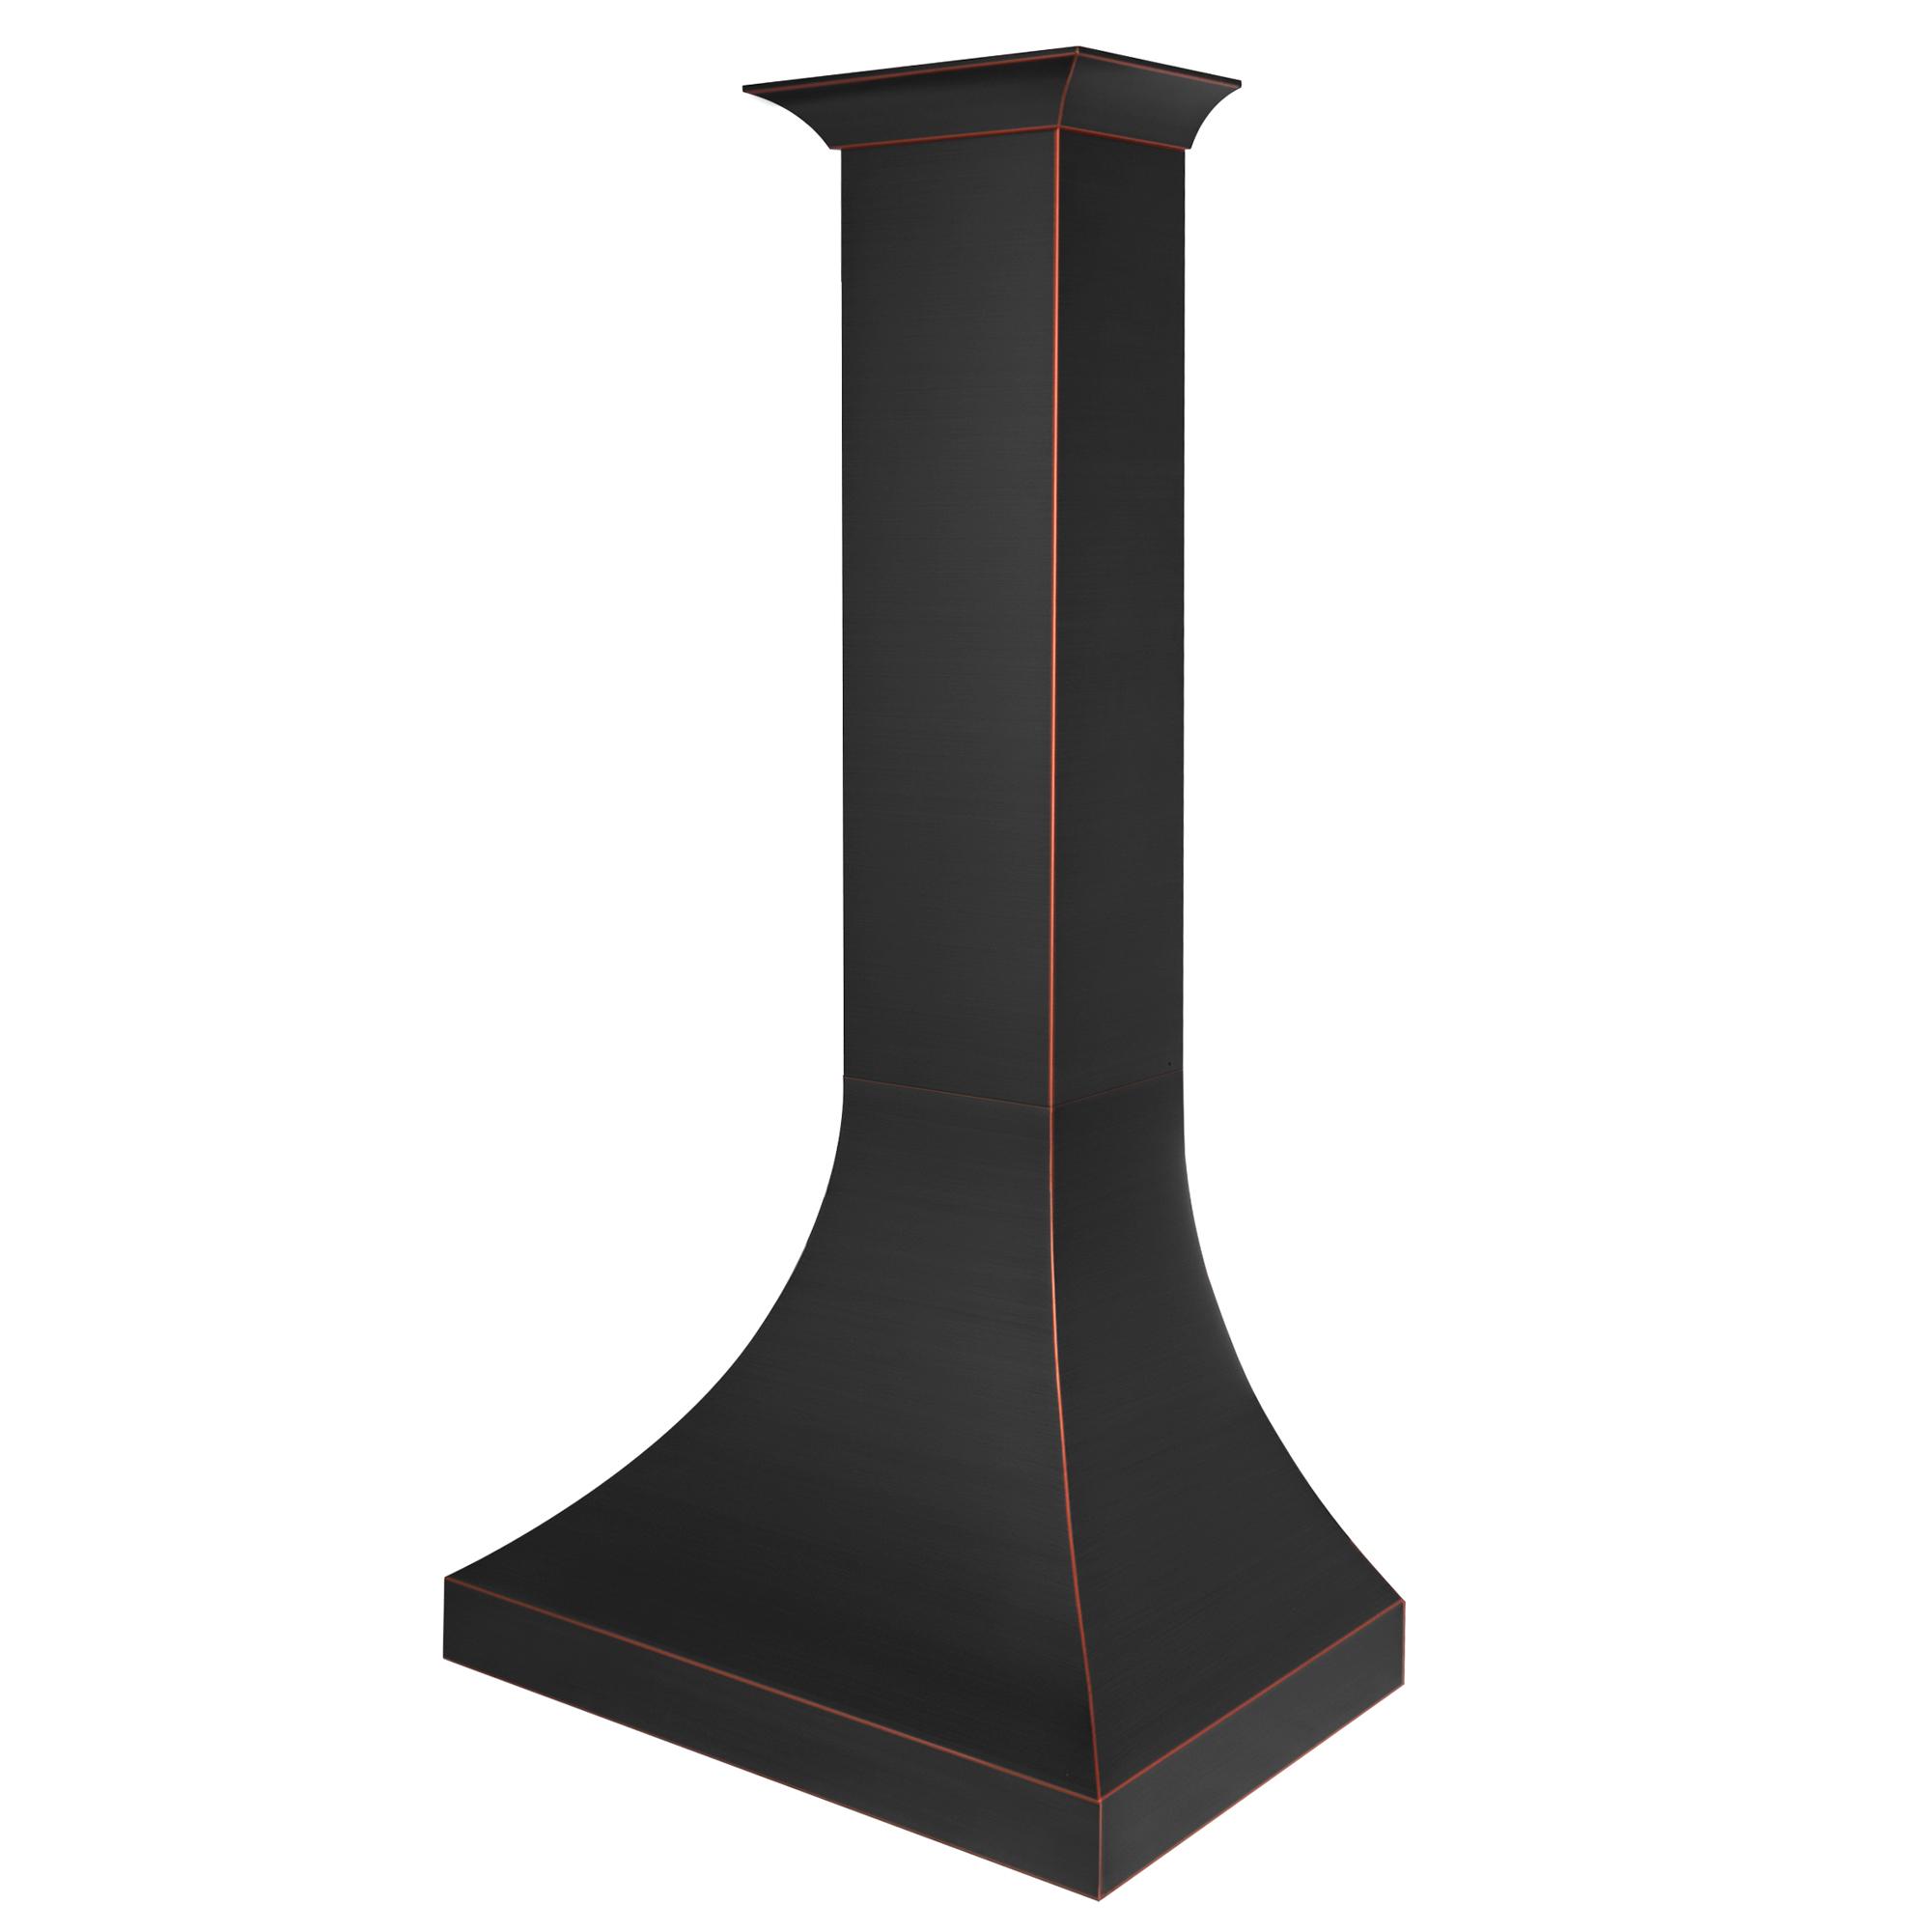 zline-bronze-wall-mounted-range-hood-8632B-kitchen-3-wb.jpg